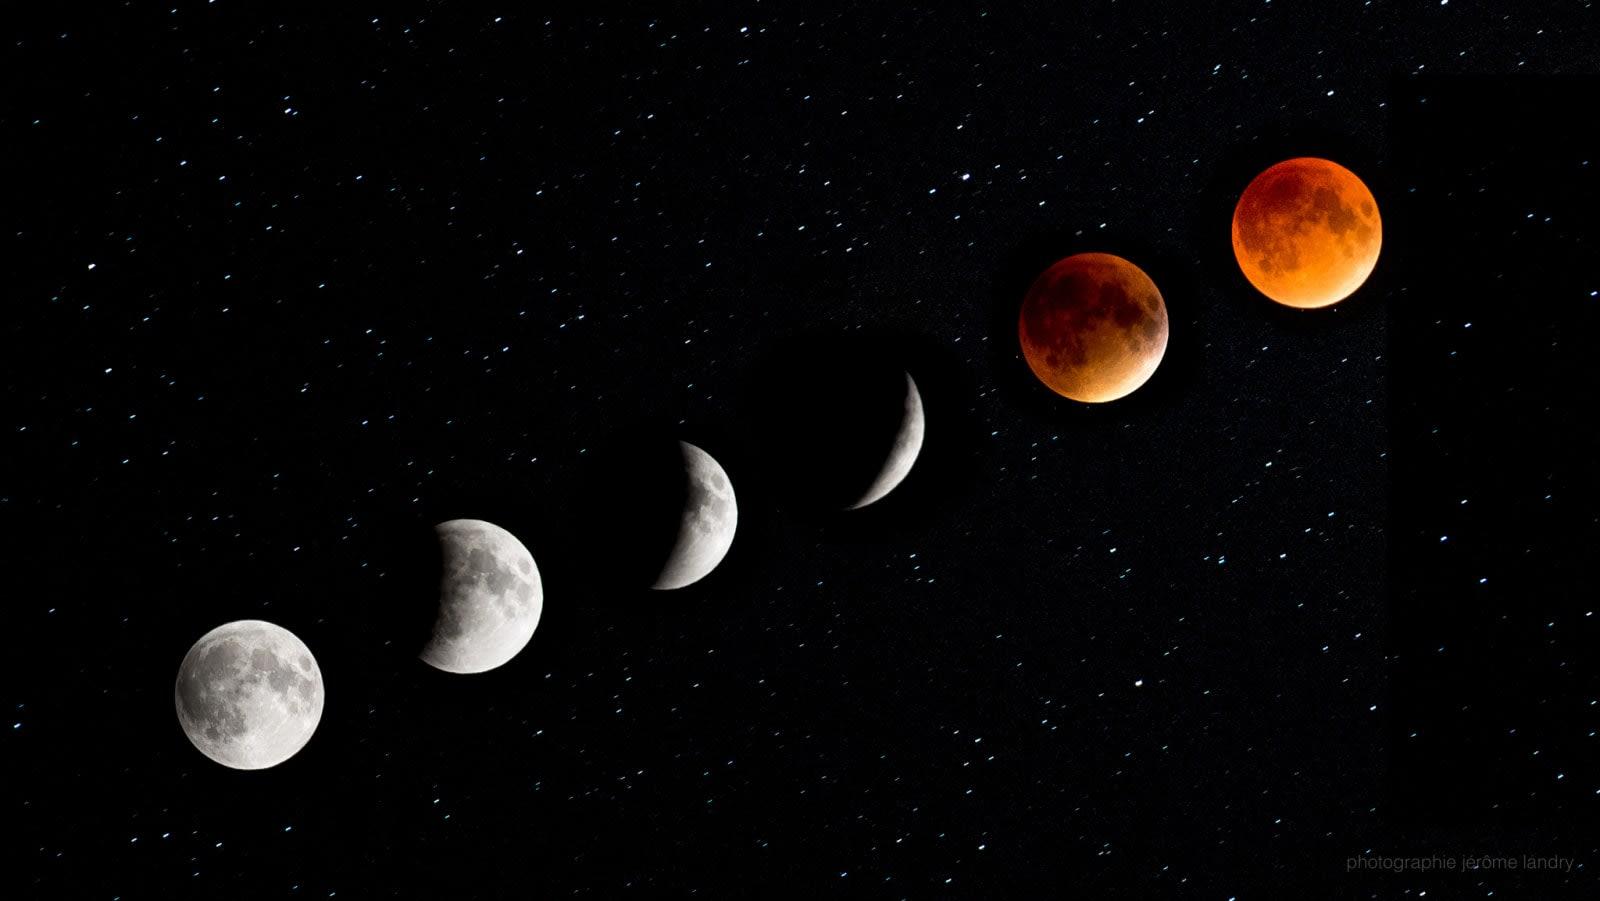 san francisco 43cfc 820c1 A rare Blue Moon lunar eclipse will happen this month